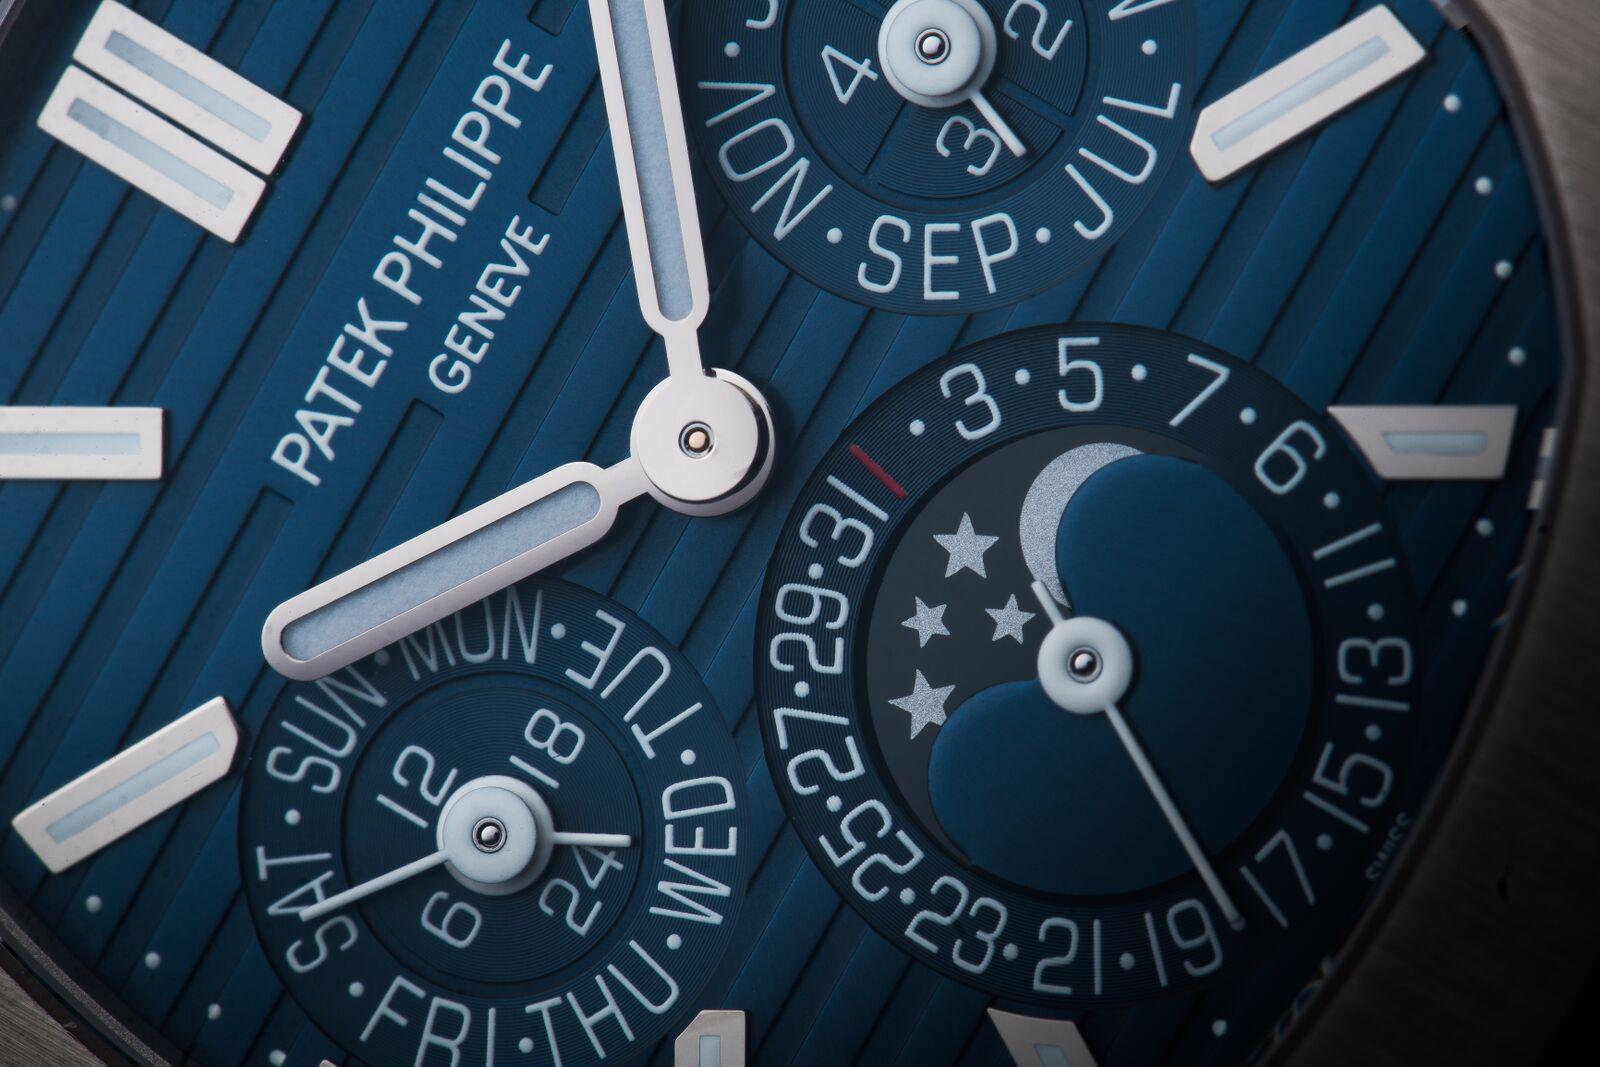 Patek Philippe Nautilus Perpetual Calendar